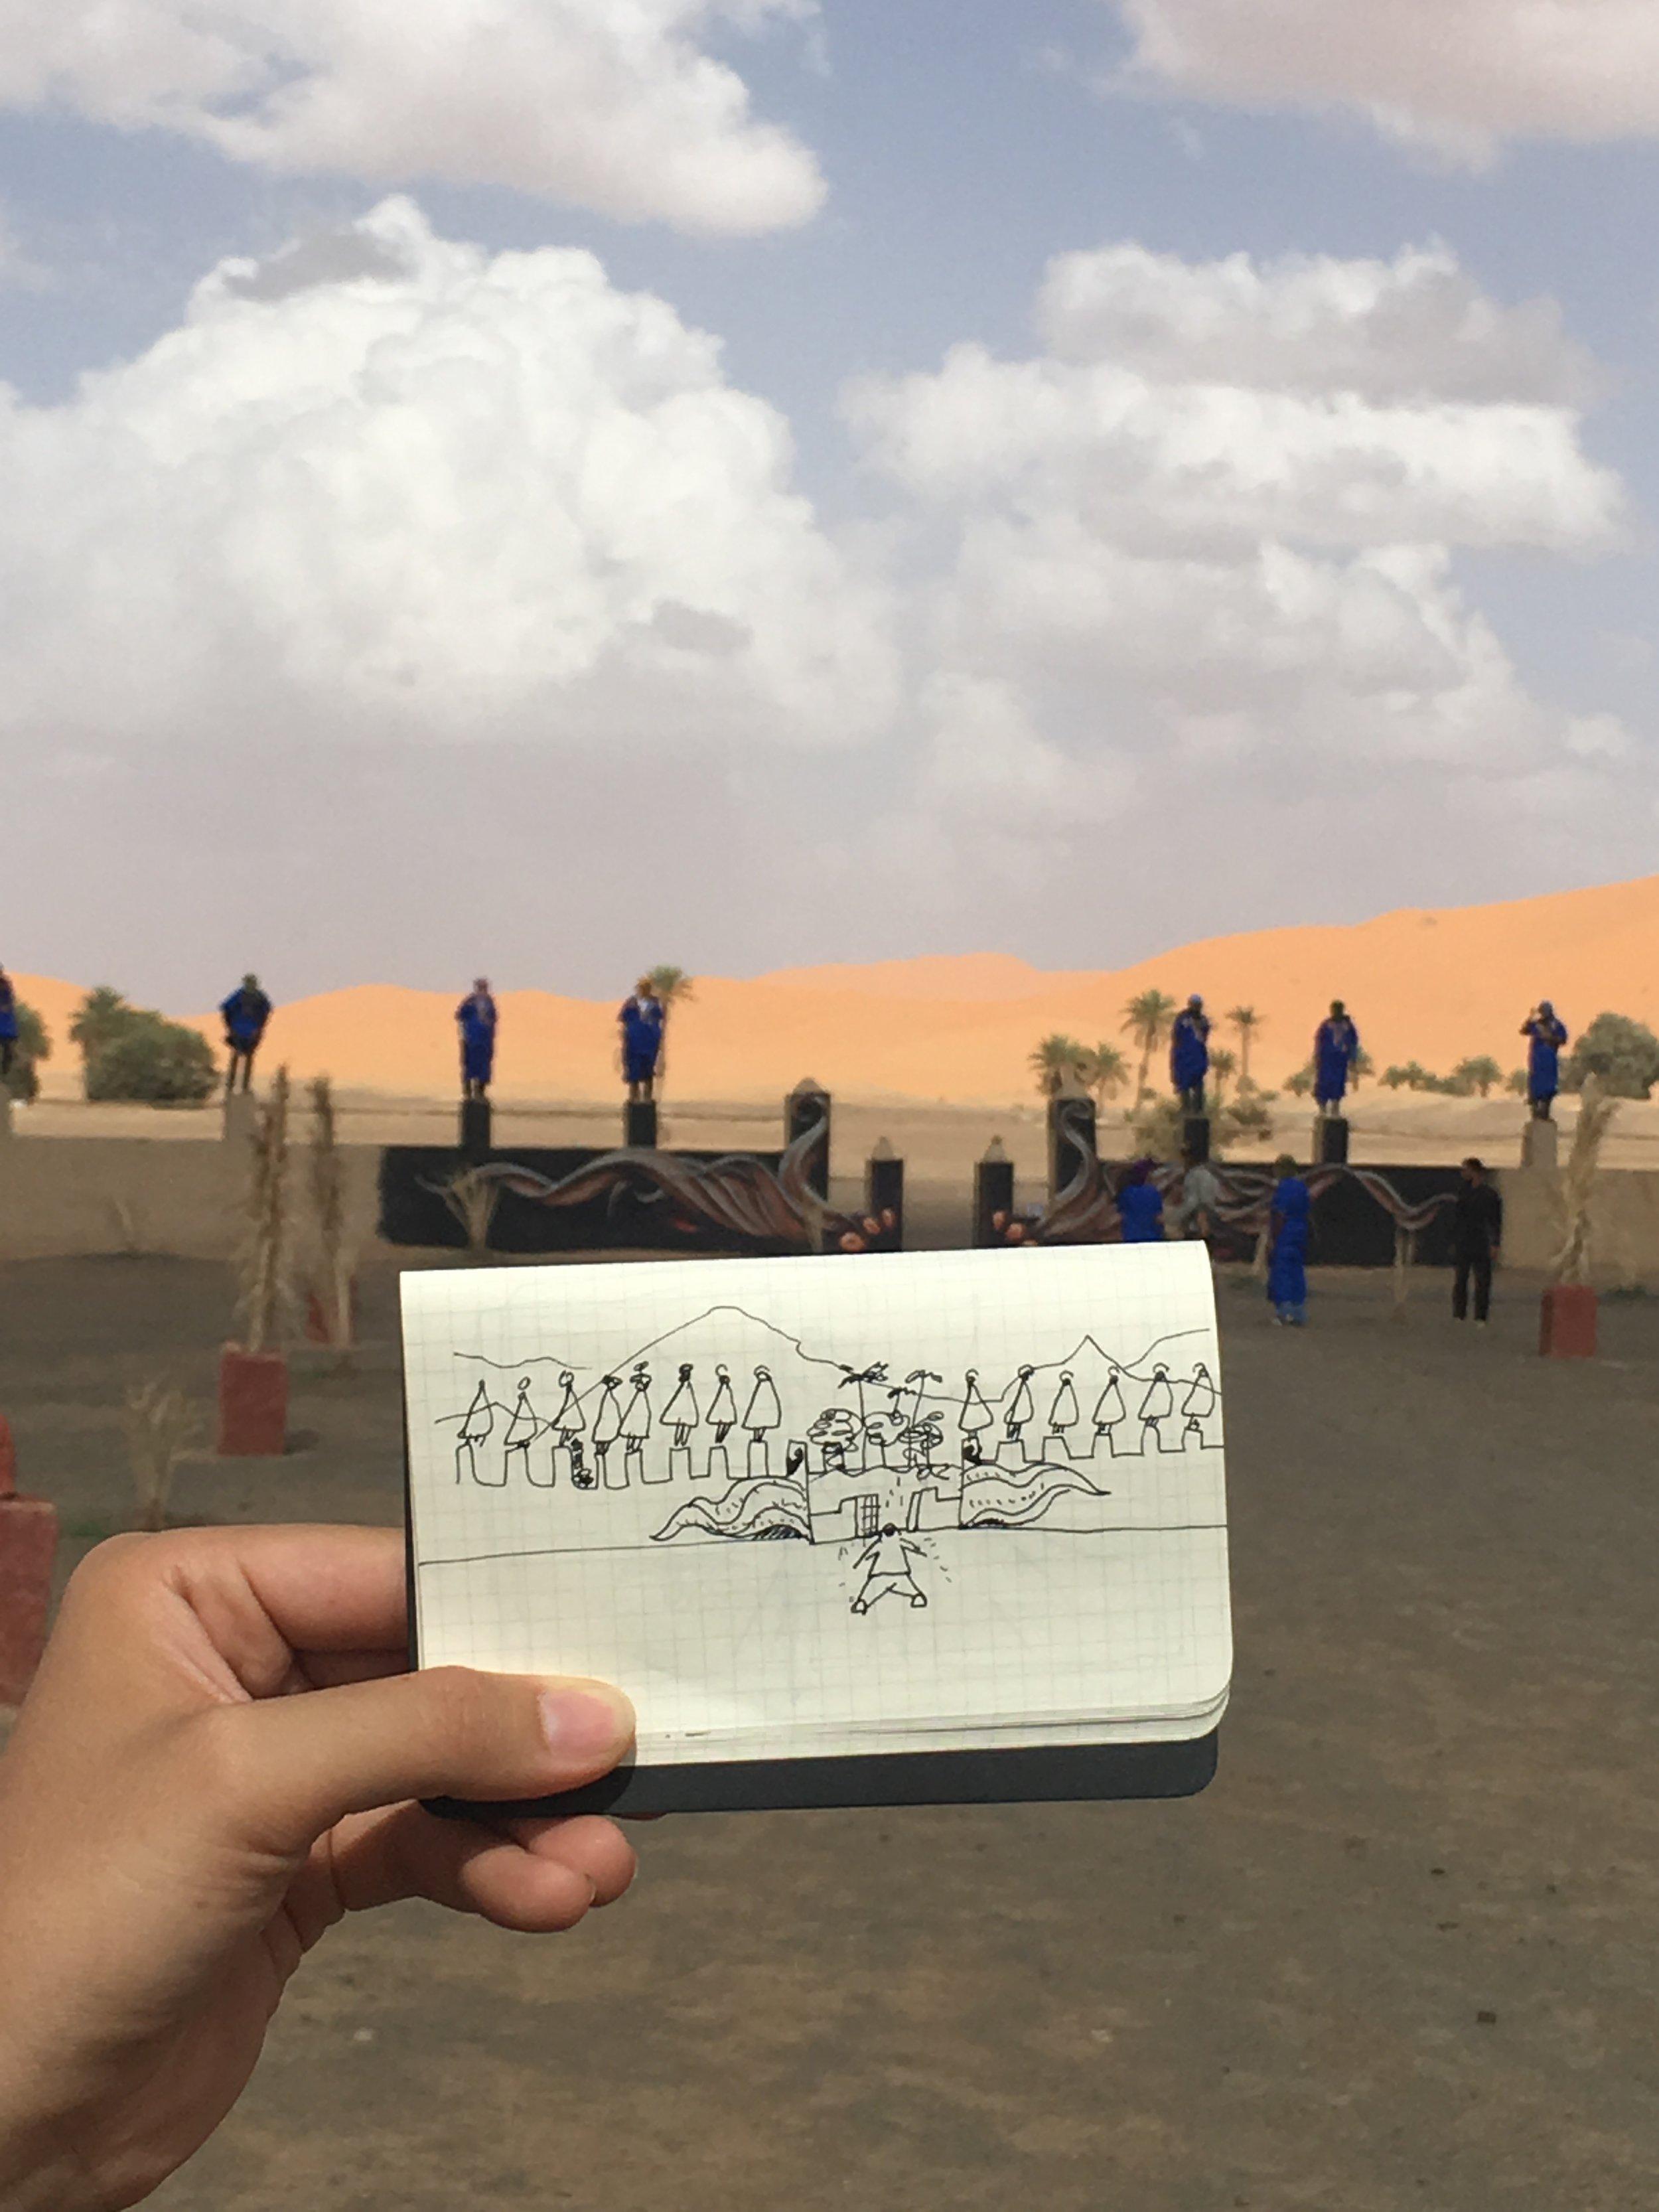 Wall ambitions. Igloo Hong project Morocco.